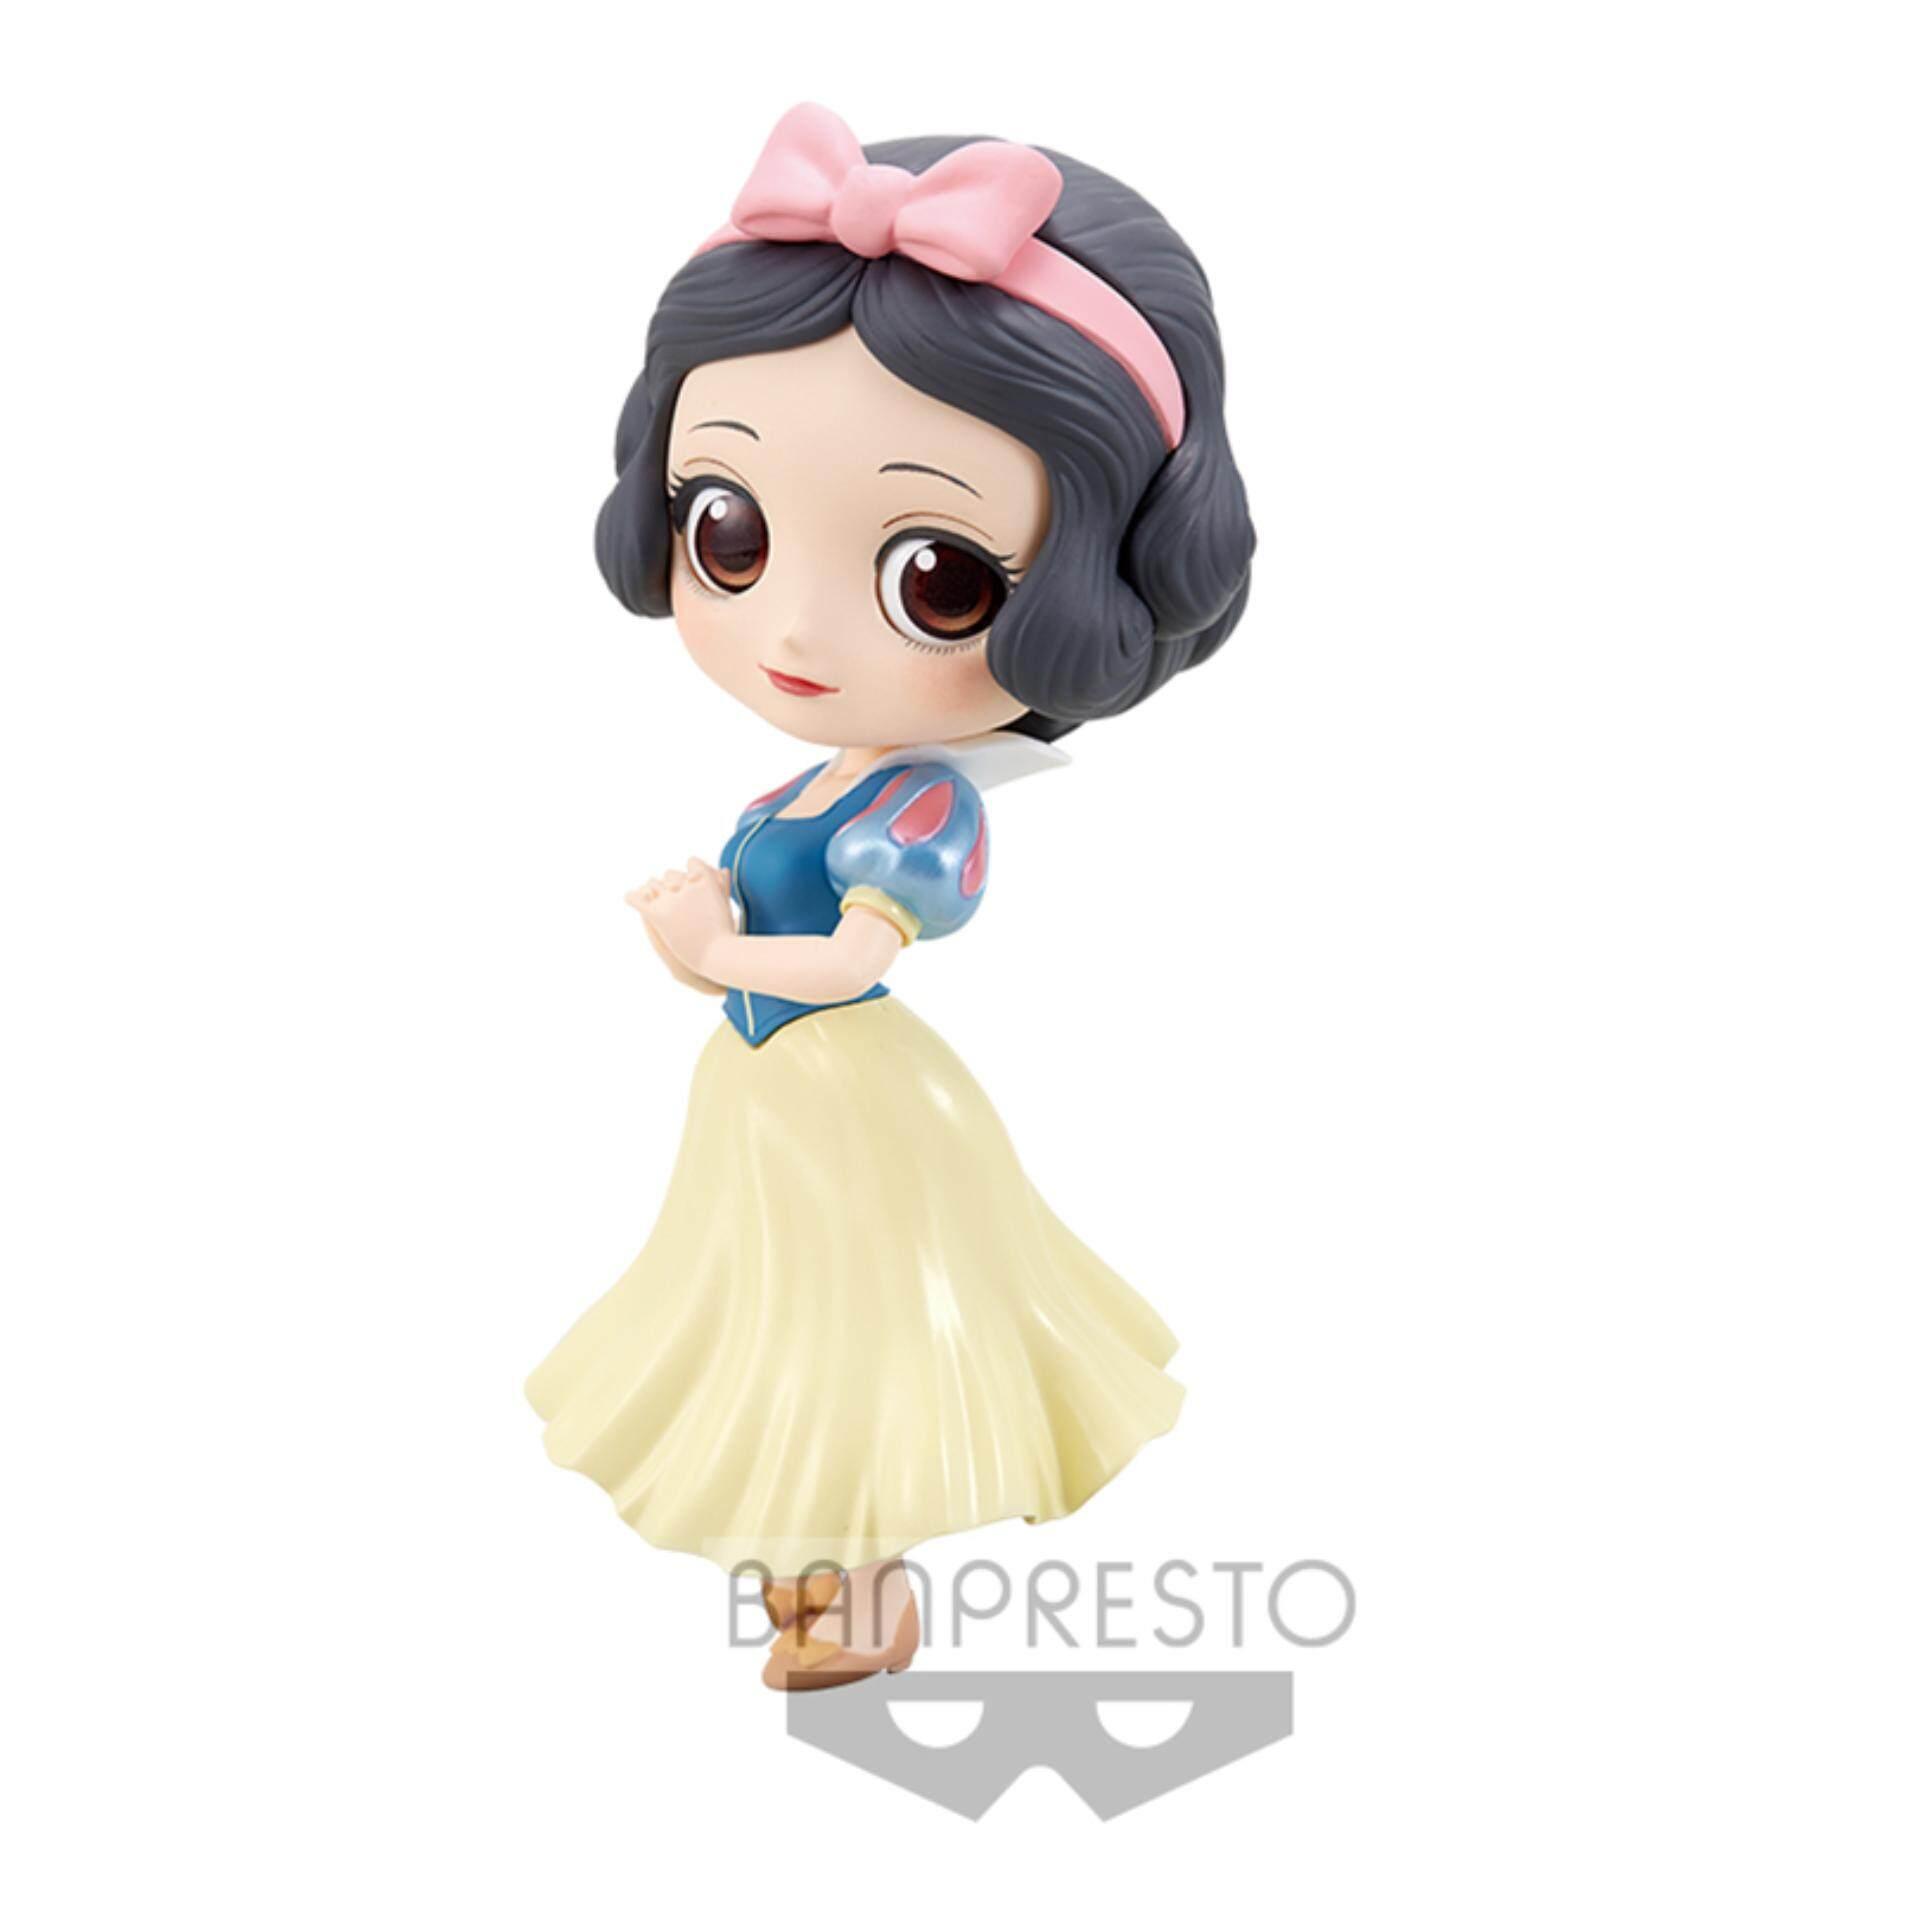 Banpresto Q Posket Disney Princess Figure Pastel Version - Snow White Toys for boys